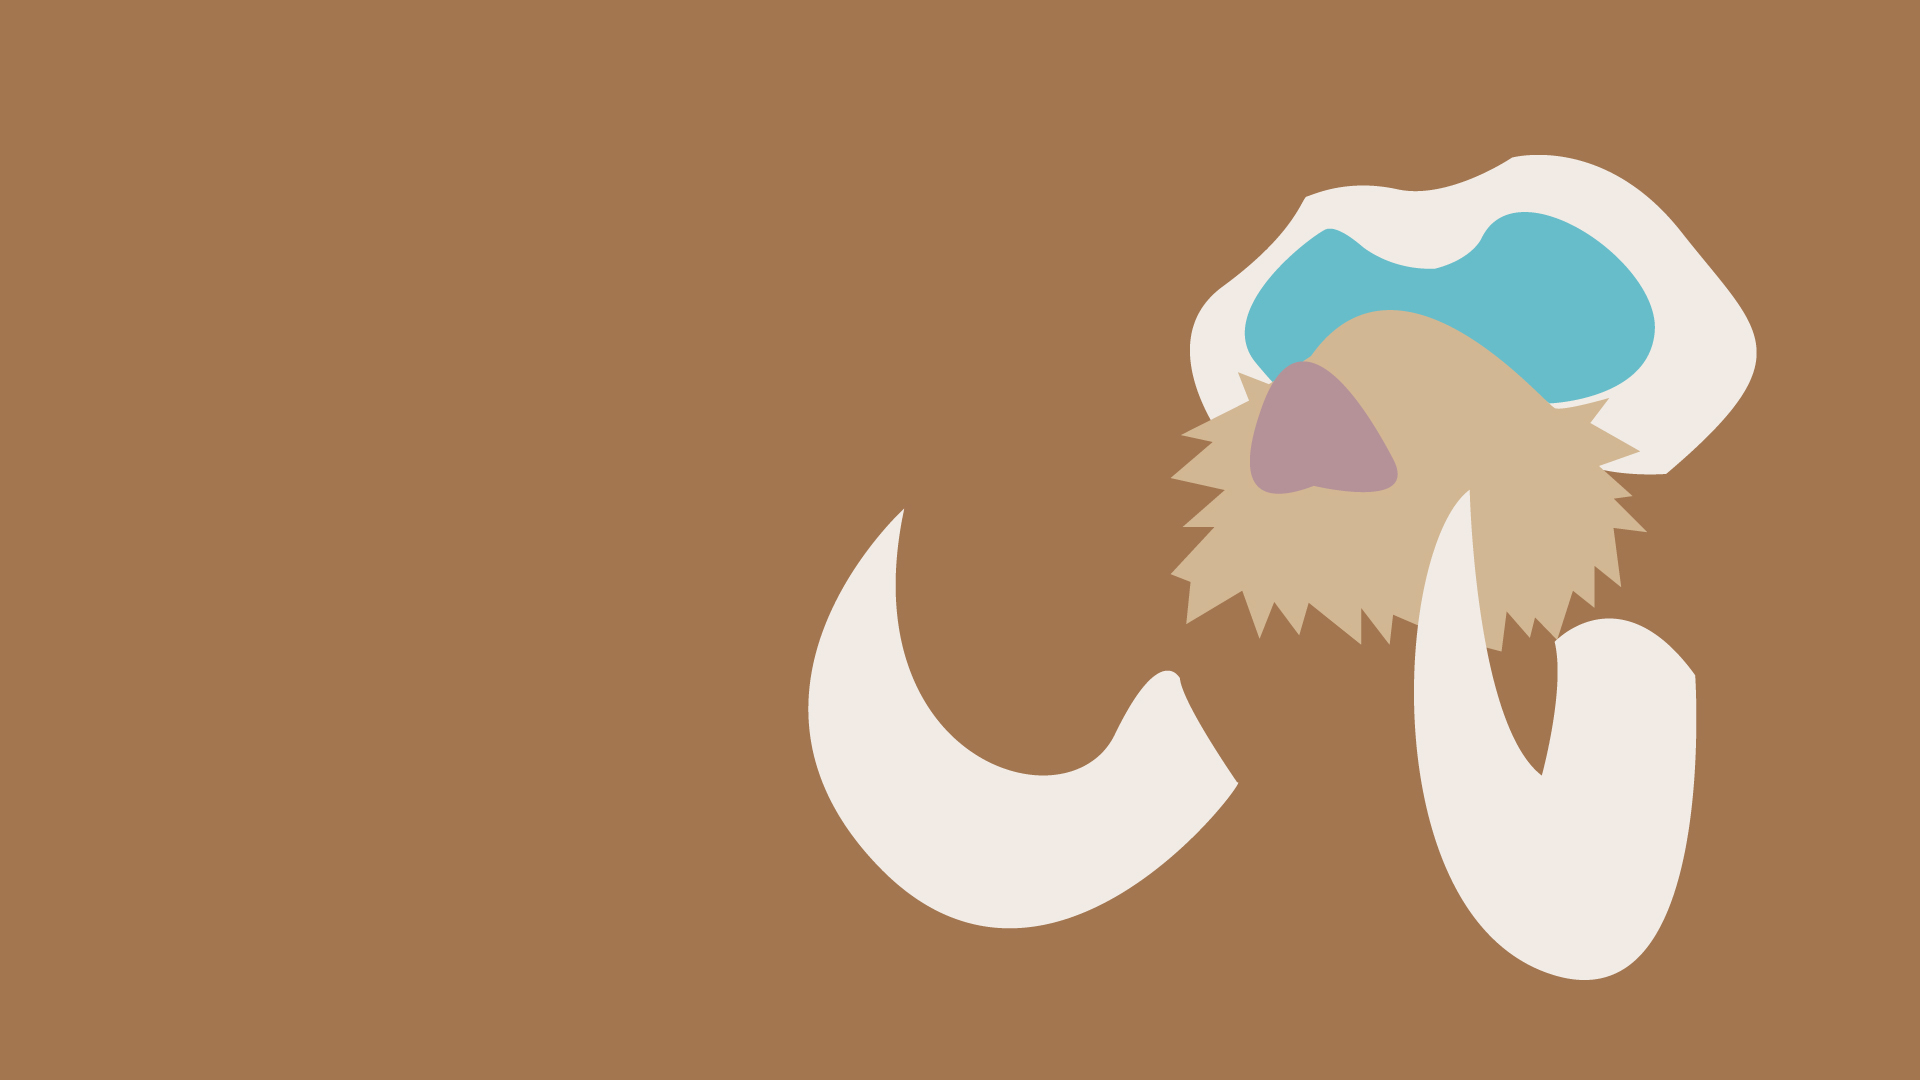 mamoswine wallpaper 48352